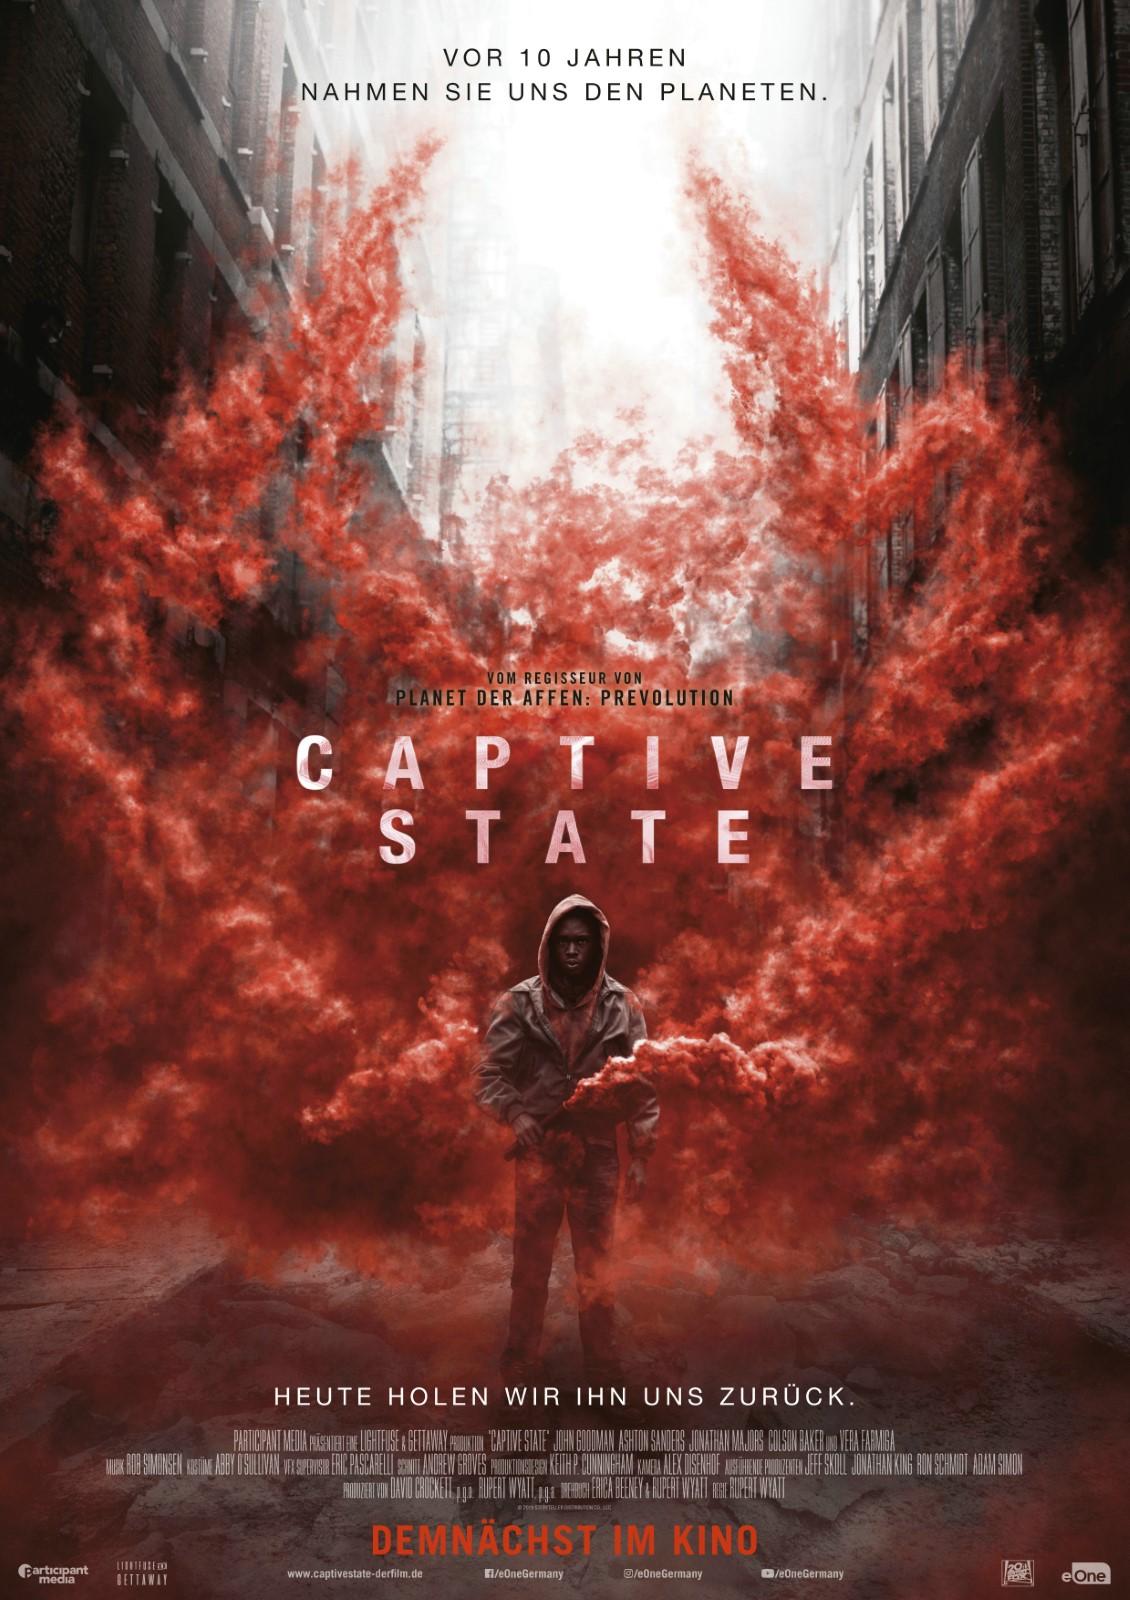 Captive State - Film 2019 - FILMSTARTS.de